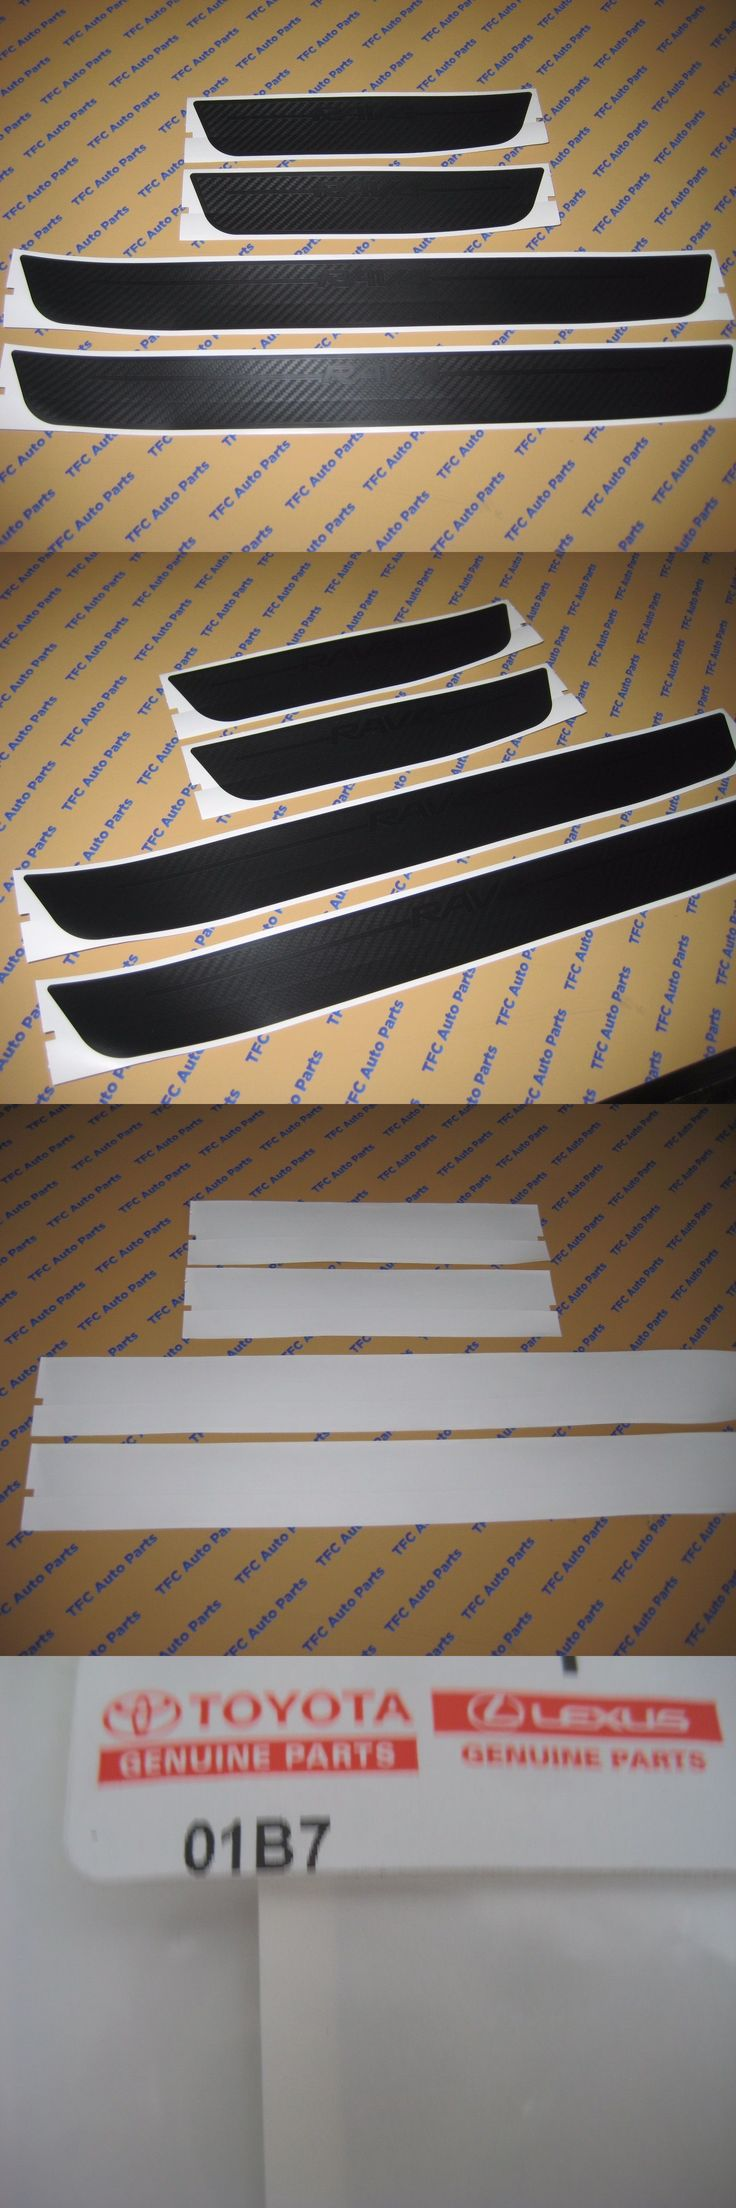 Auto parts general toyota rav4 door sill protectors kit genuine oem factory new 2013